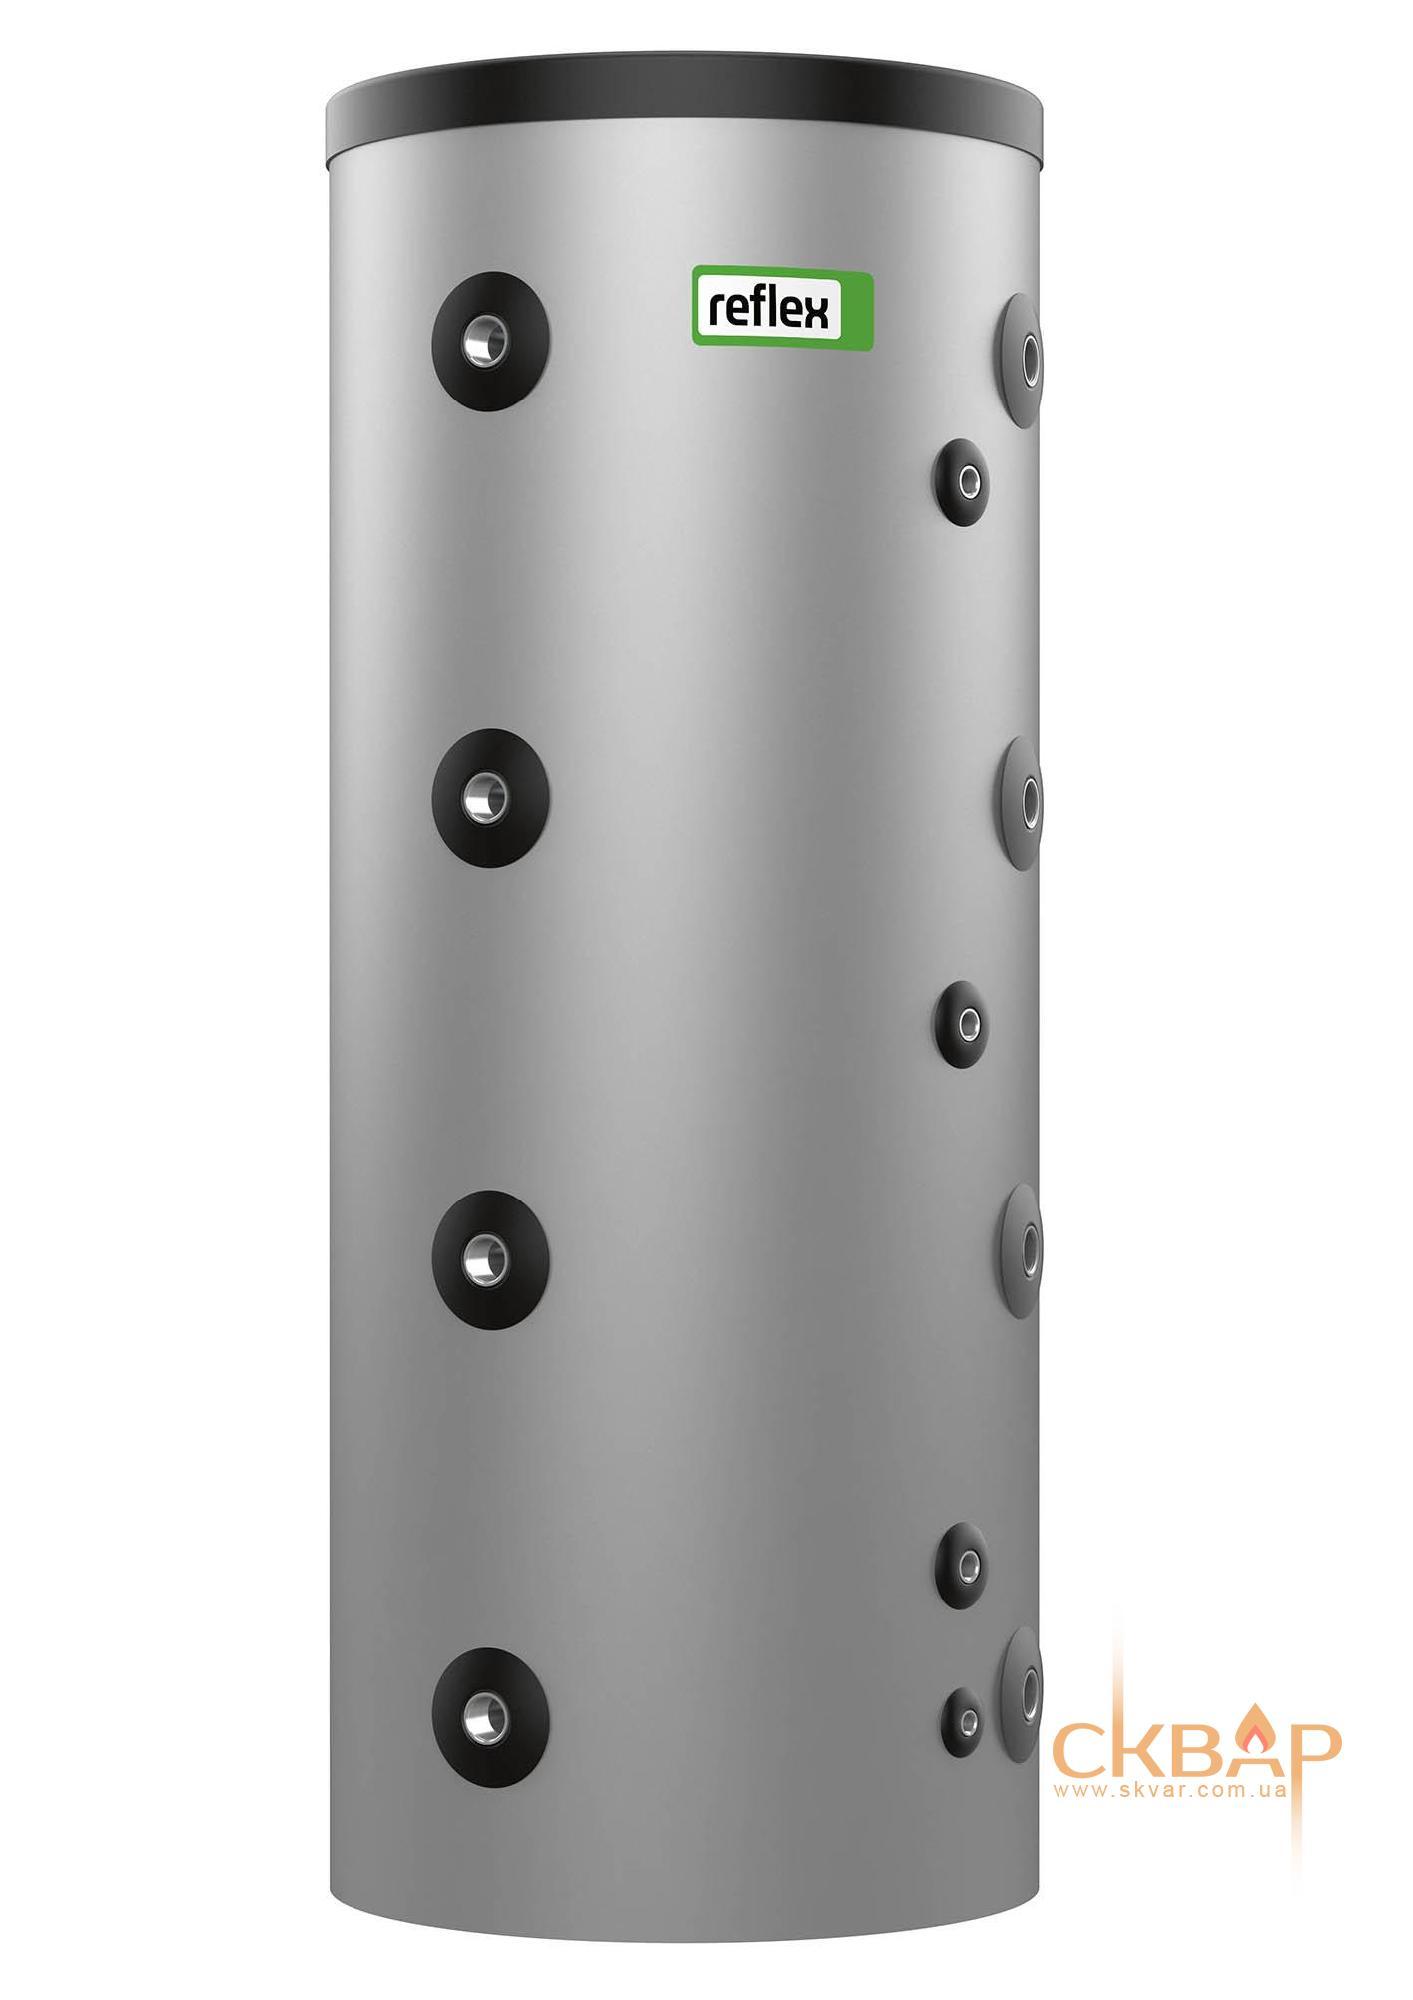 Reflex Storatherm Heat  HF 300 (8502010)